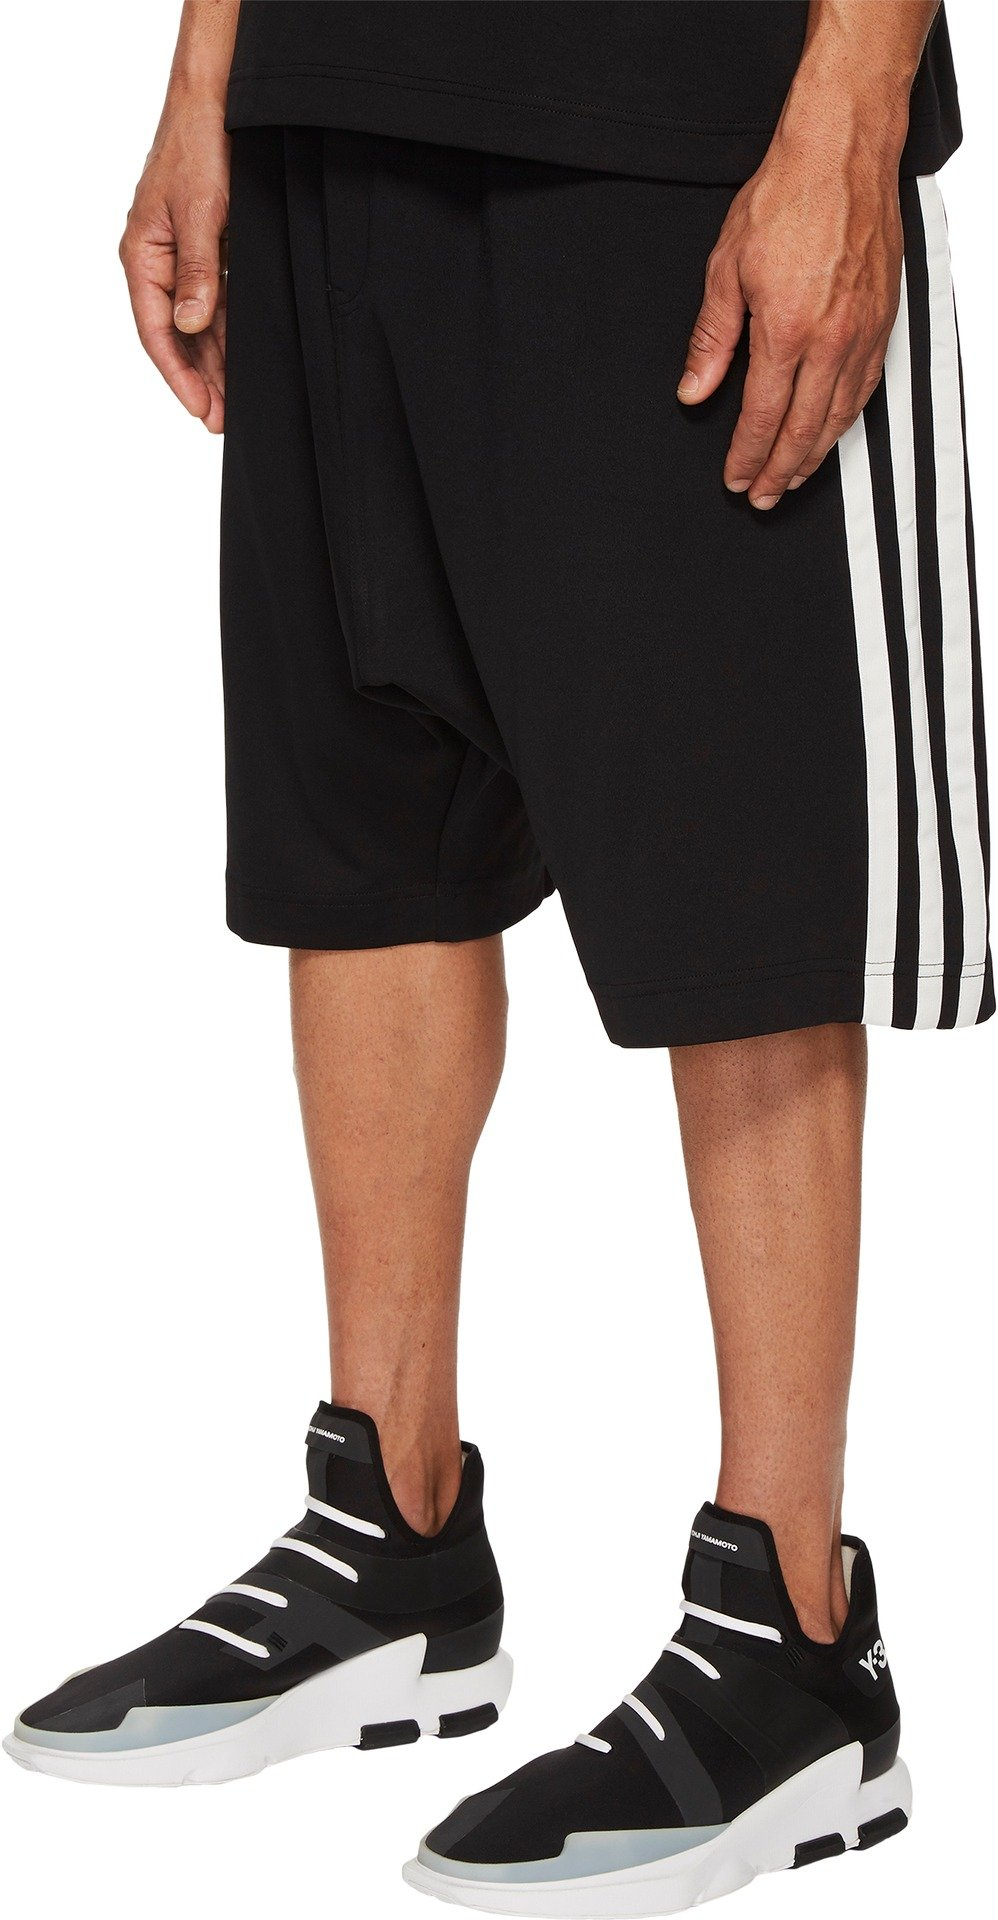 adidas Y-3 by Yohji Yamamoto Men's 3-Stripes Shorts Black/Core White Medium